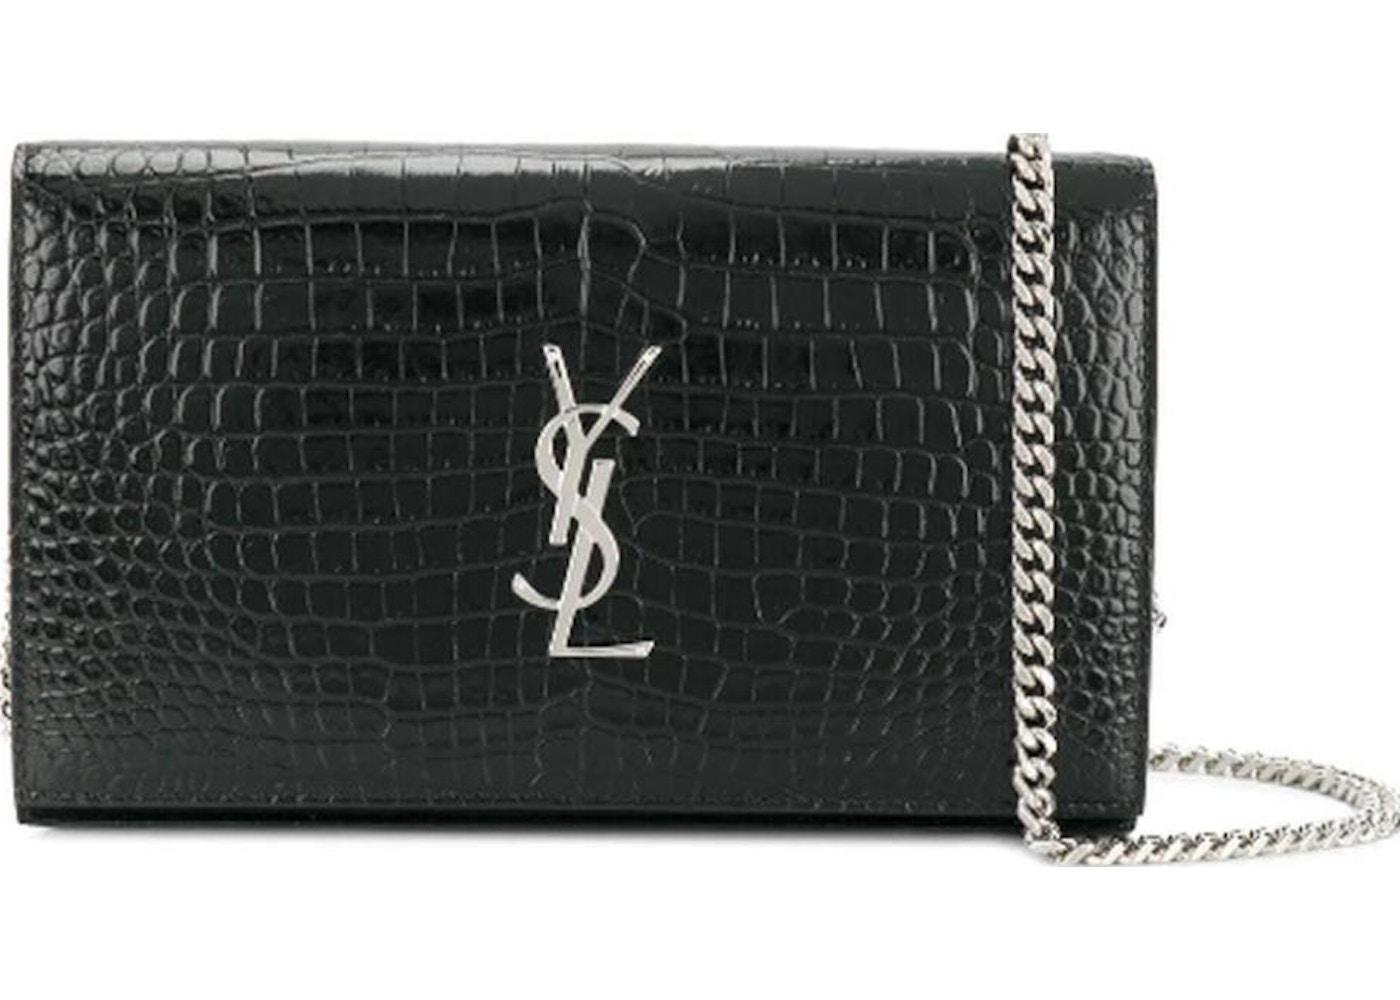 fddde94574 Saint Laurent Wallet on Chain Monogram Crocodile Black